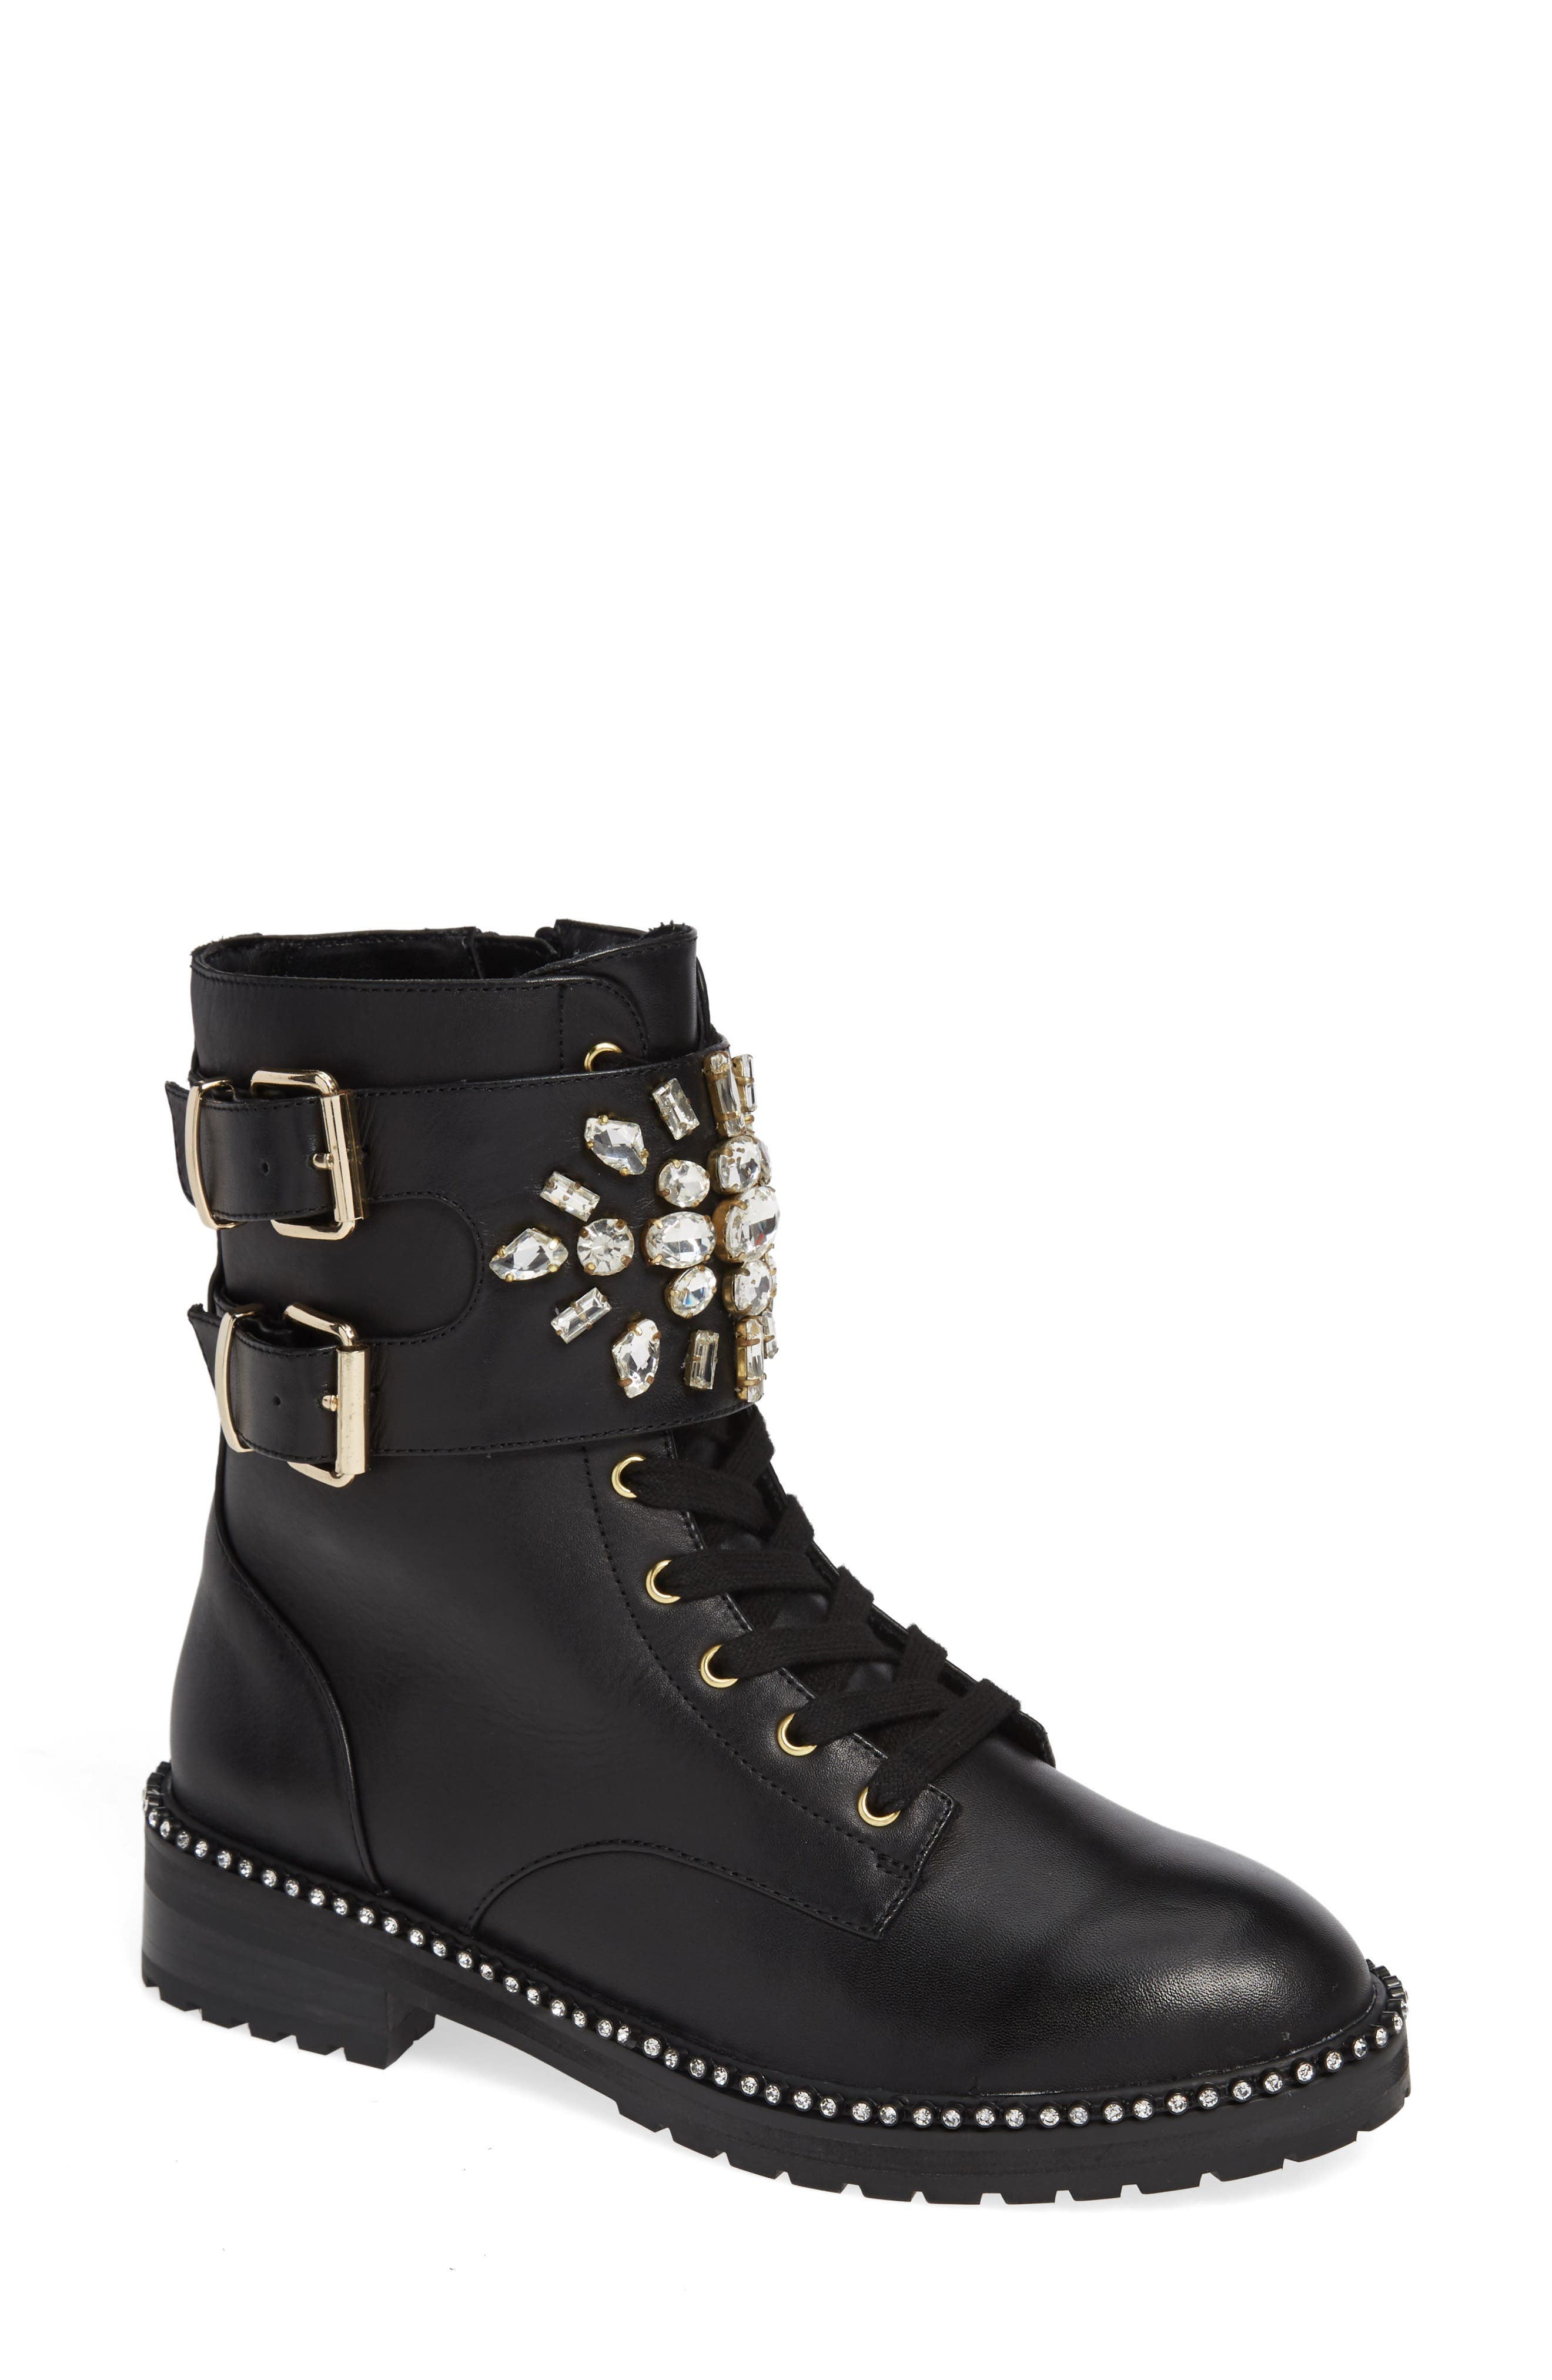 KURT GEIGER Women'S Stoop Embellished Boots in Black Leather